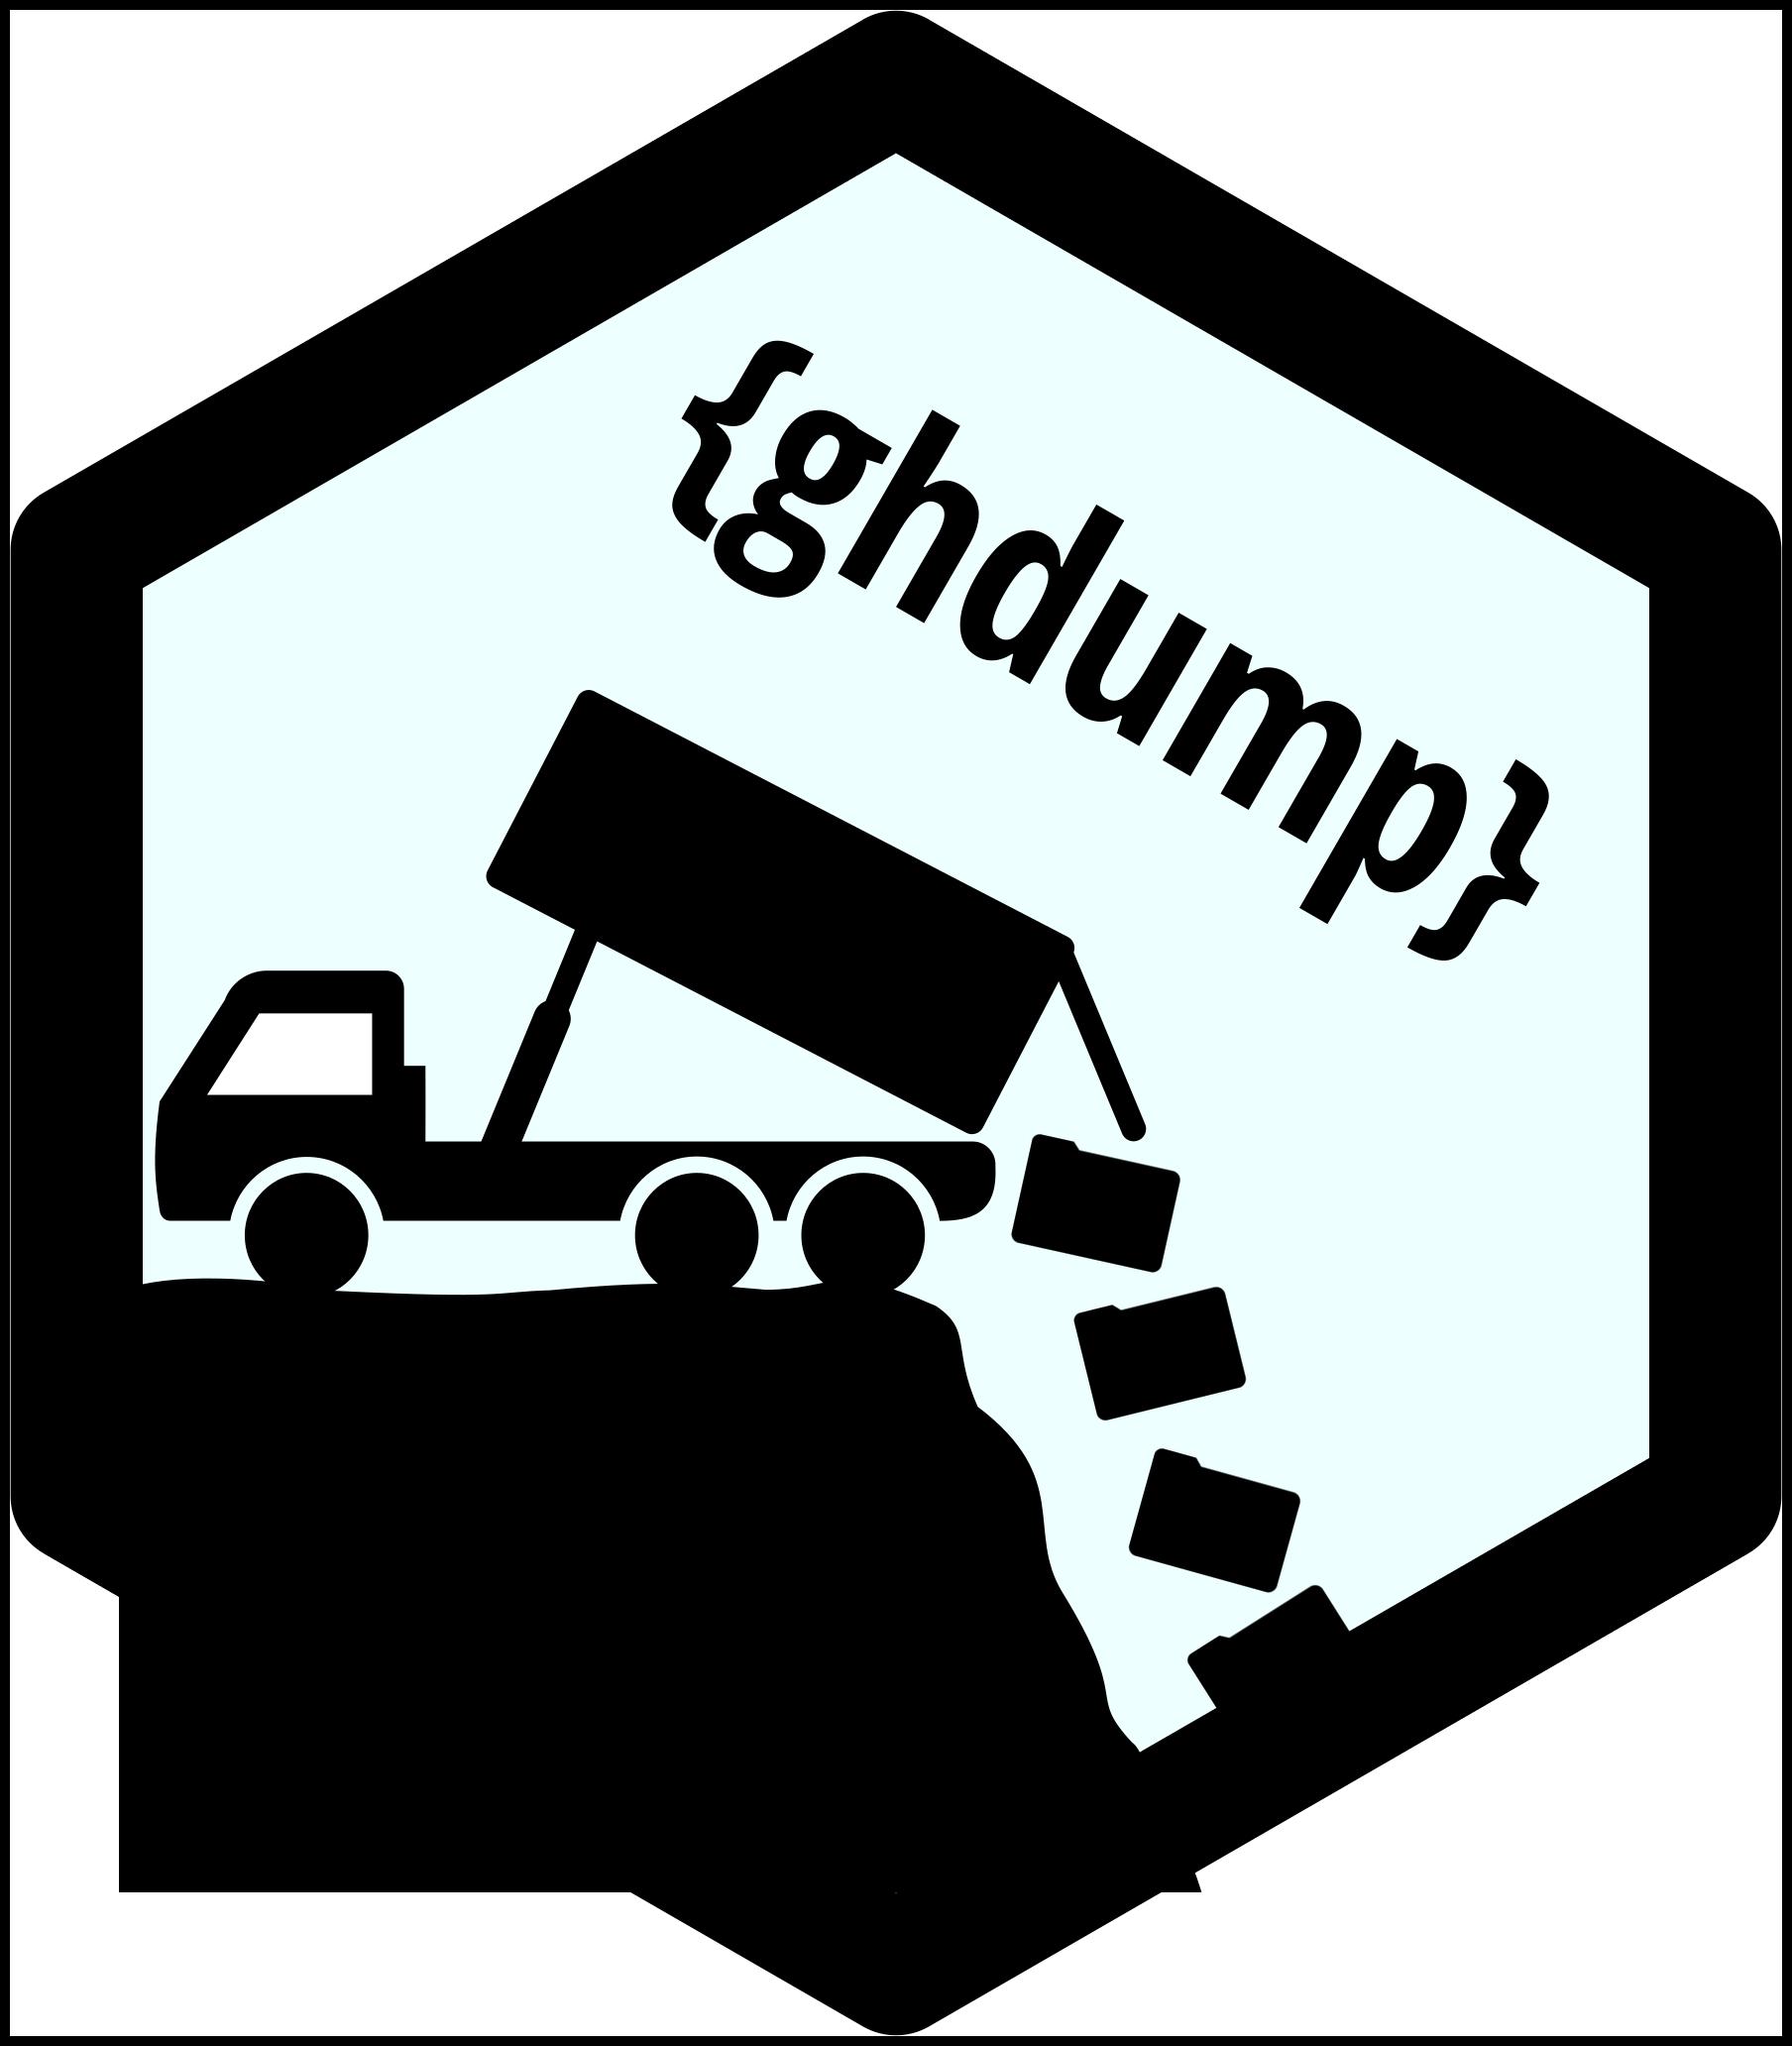 A silhouette of a dump truck dumping trash bags.